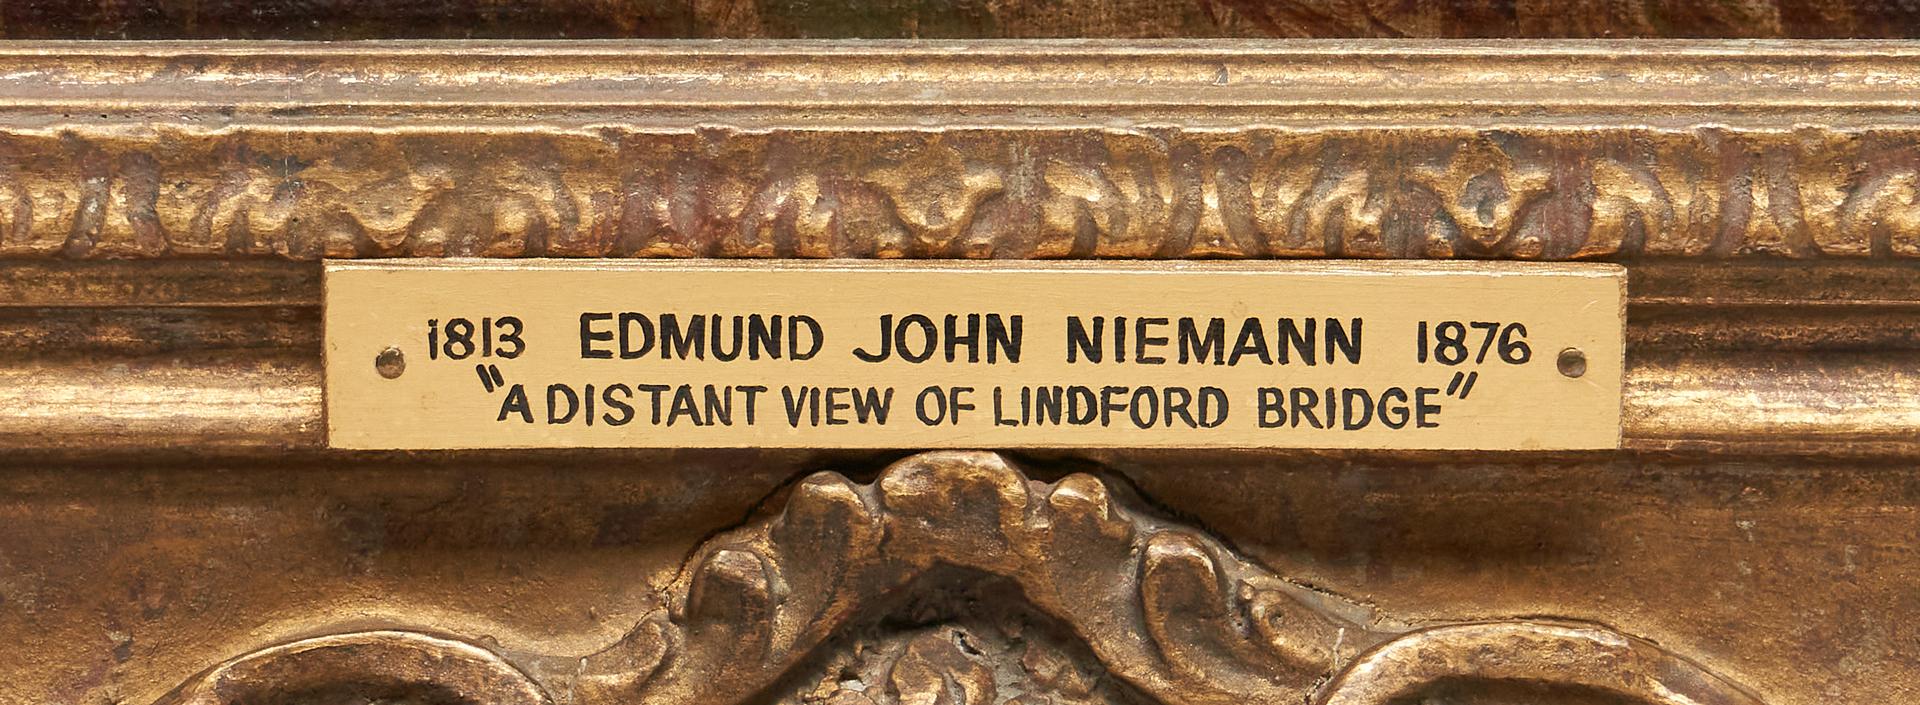 Lot 392: Edmund Johann Niemann O/C, View of Lindford Bridge